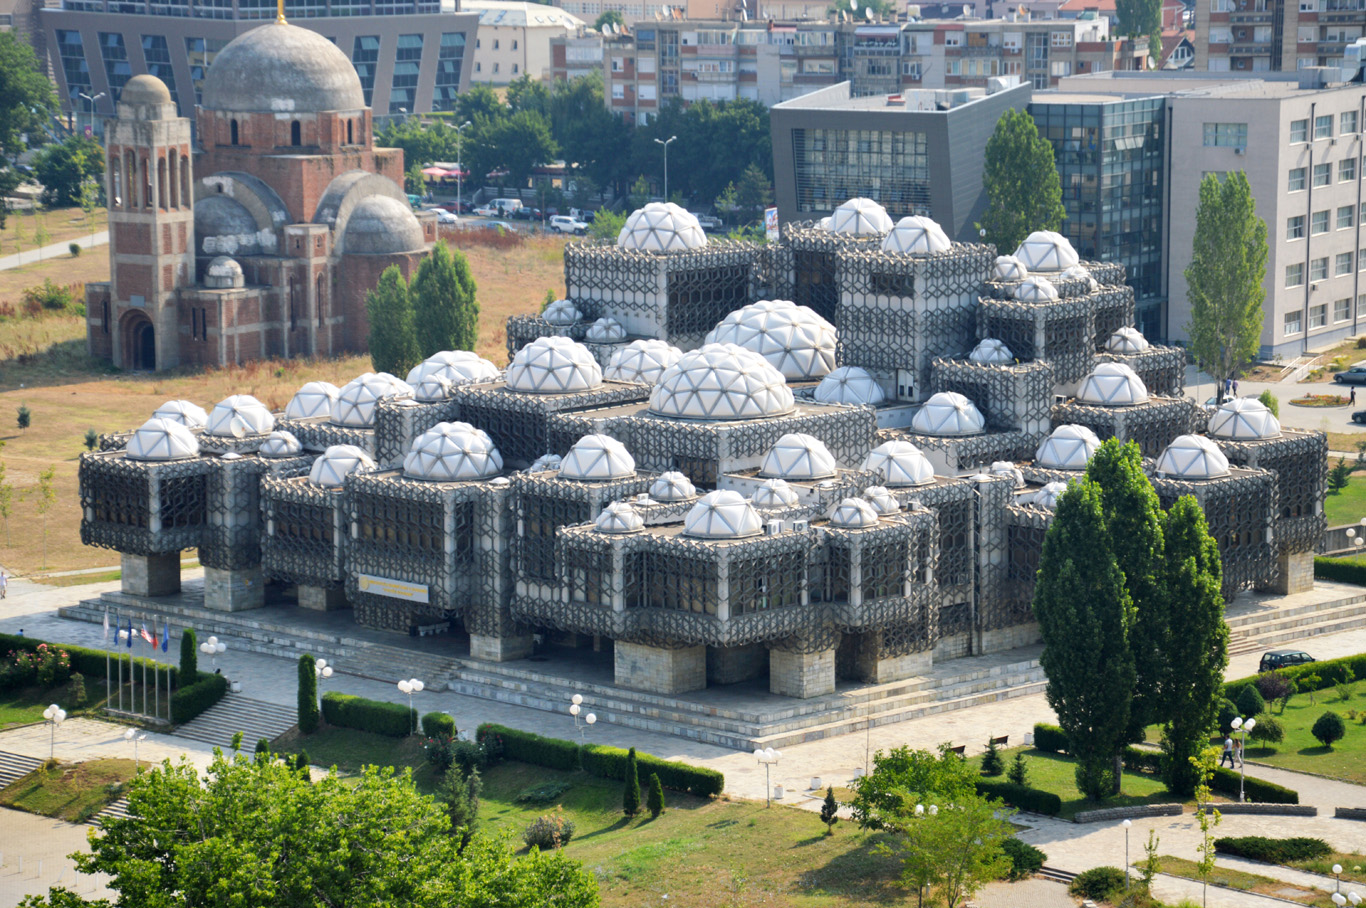 Full Day Tour of Pristina from Tirana